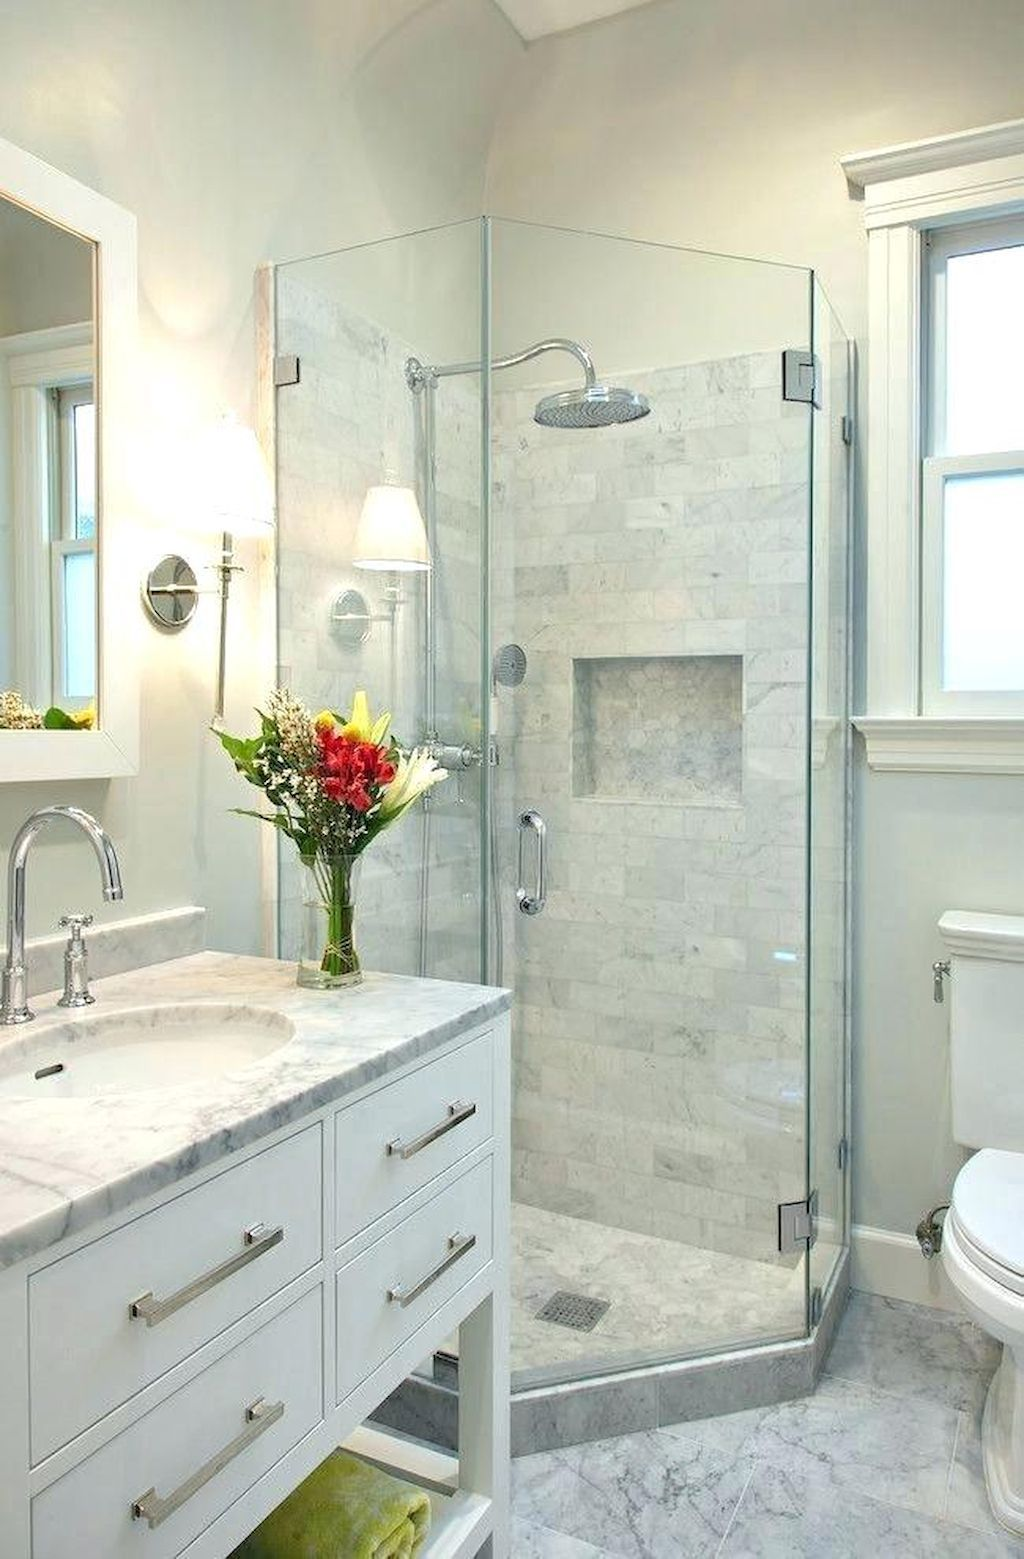 Cool 65 Beautiful Modern Bathroom Shower Ideas Https Homespecially Com 65 Beautiful Modern Bathr Small Master Bathroom Bathroom Remodel Shower Small Bathroom